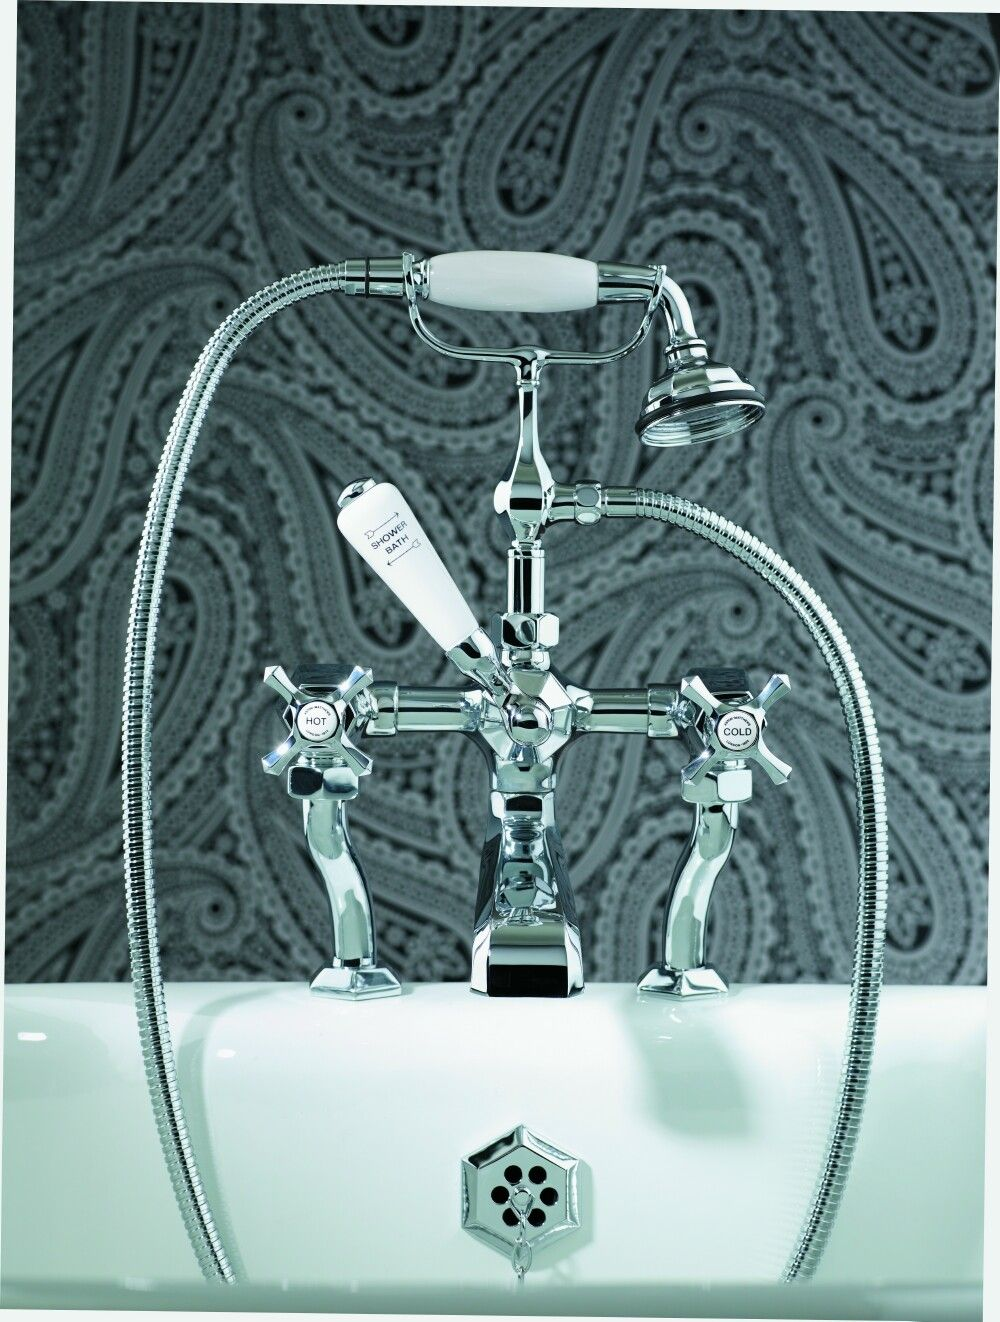 Deco bath filler Deco bath/shower mixer from Aston Matthews ...